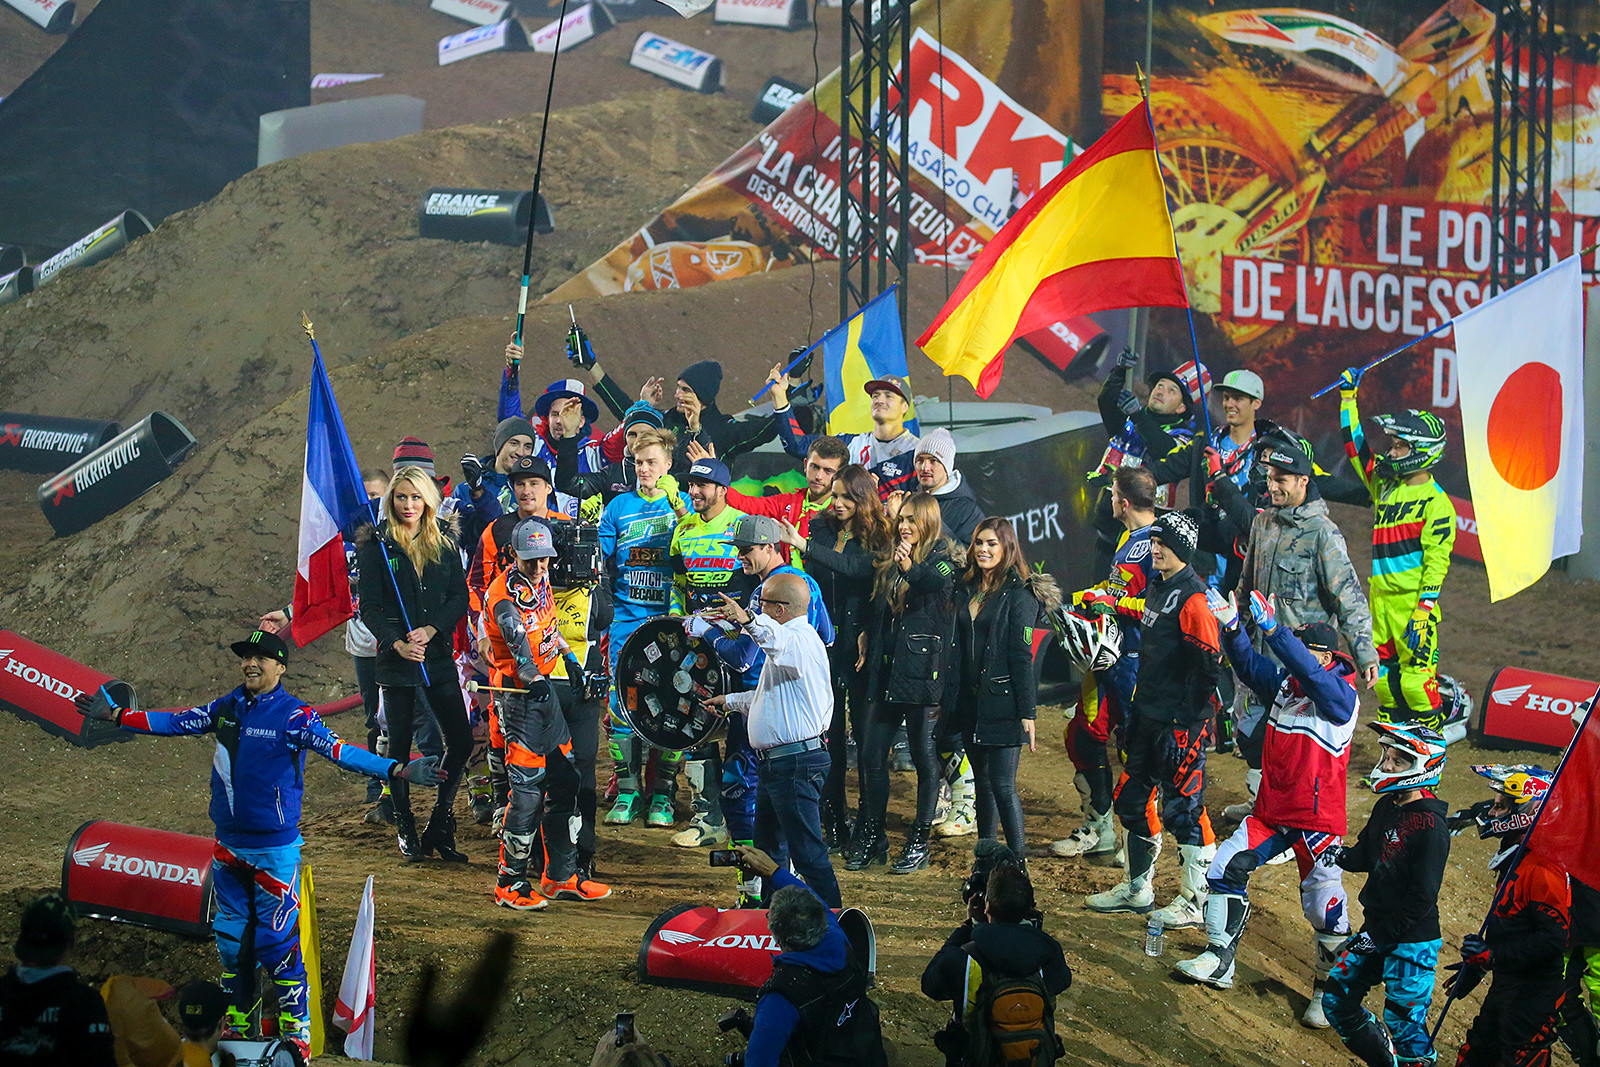 Clap along - Photo Gallery: Paris-Lille Supercross, Day 2 - Motocross Pictures - Vital MX